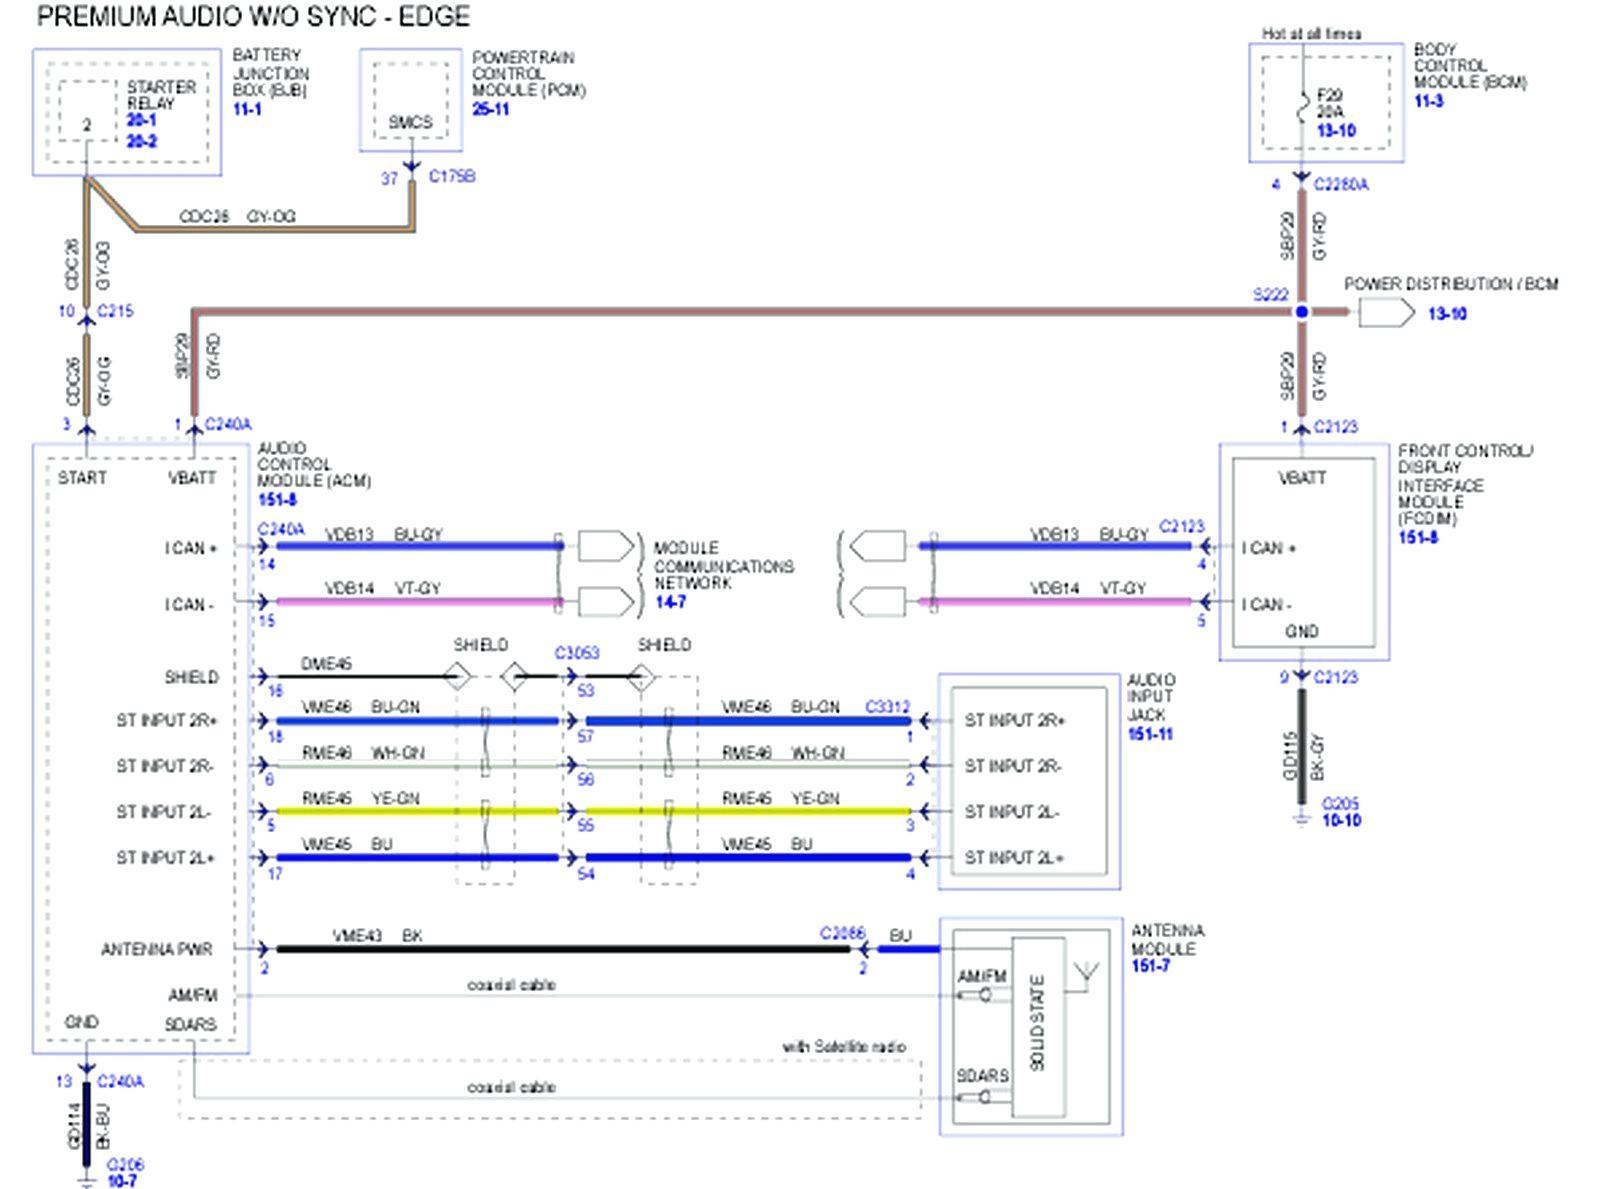 2016 ford fusion radio wiring diagram - 2007 ford fusion radio wiring  diagram wire center u2022